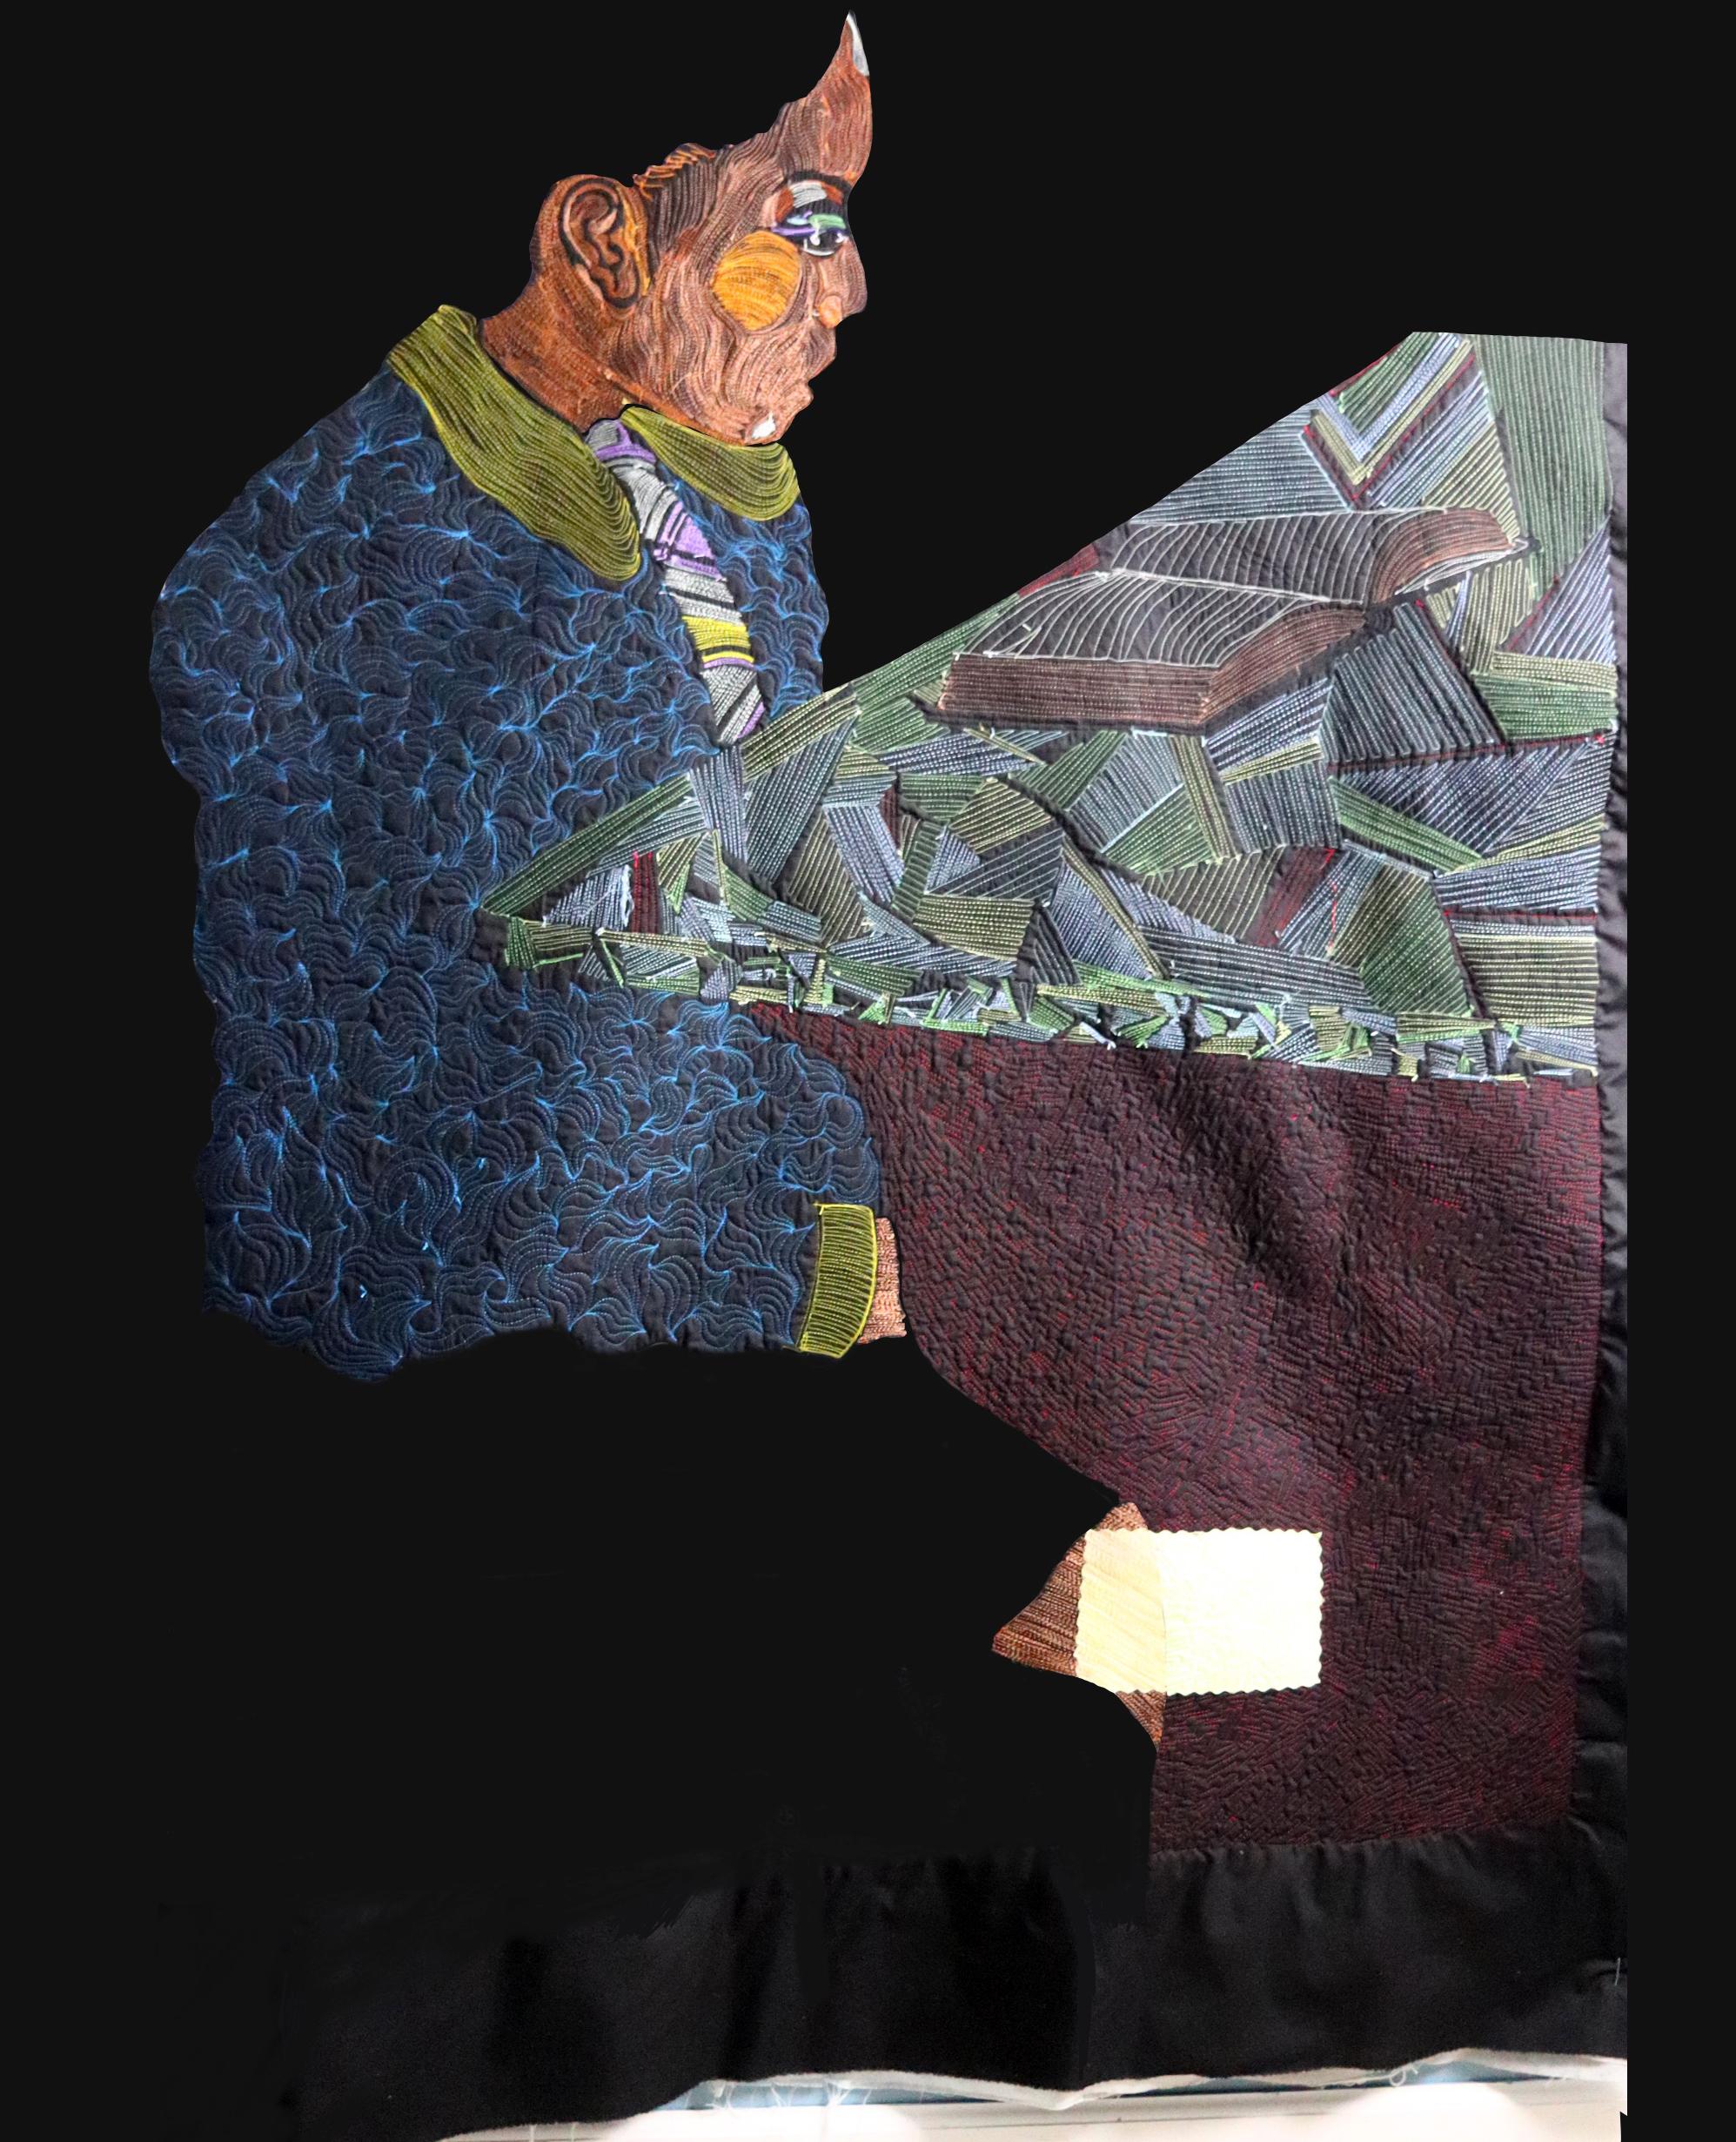 I am a Child | Work in Progress | Textile Art